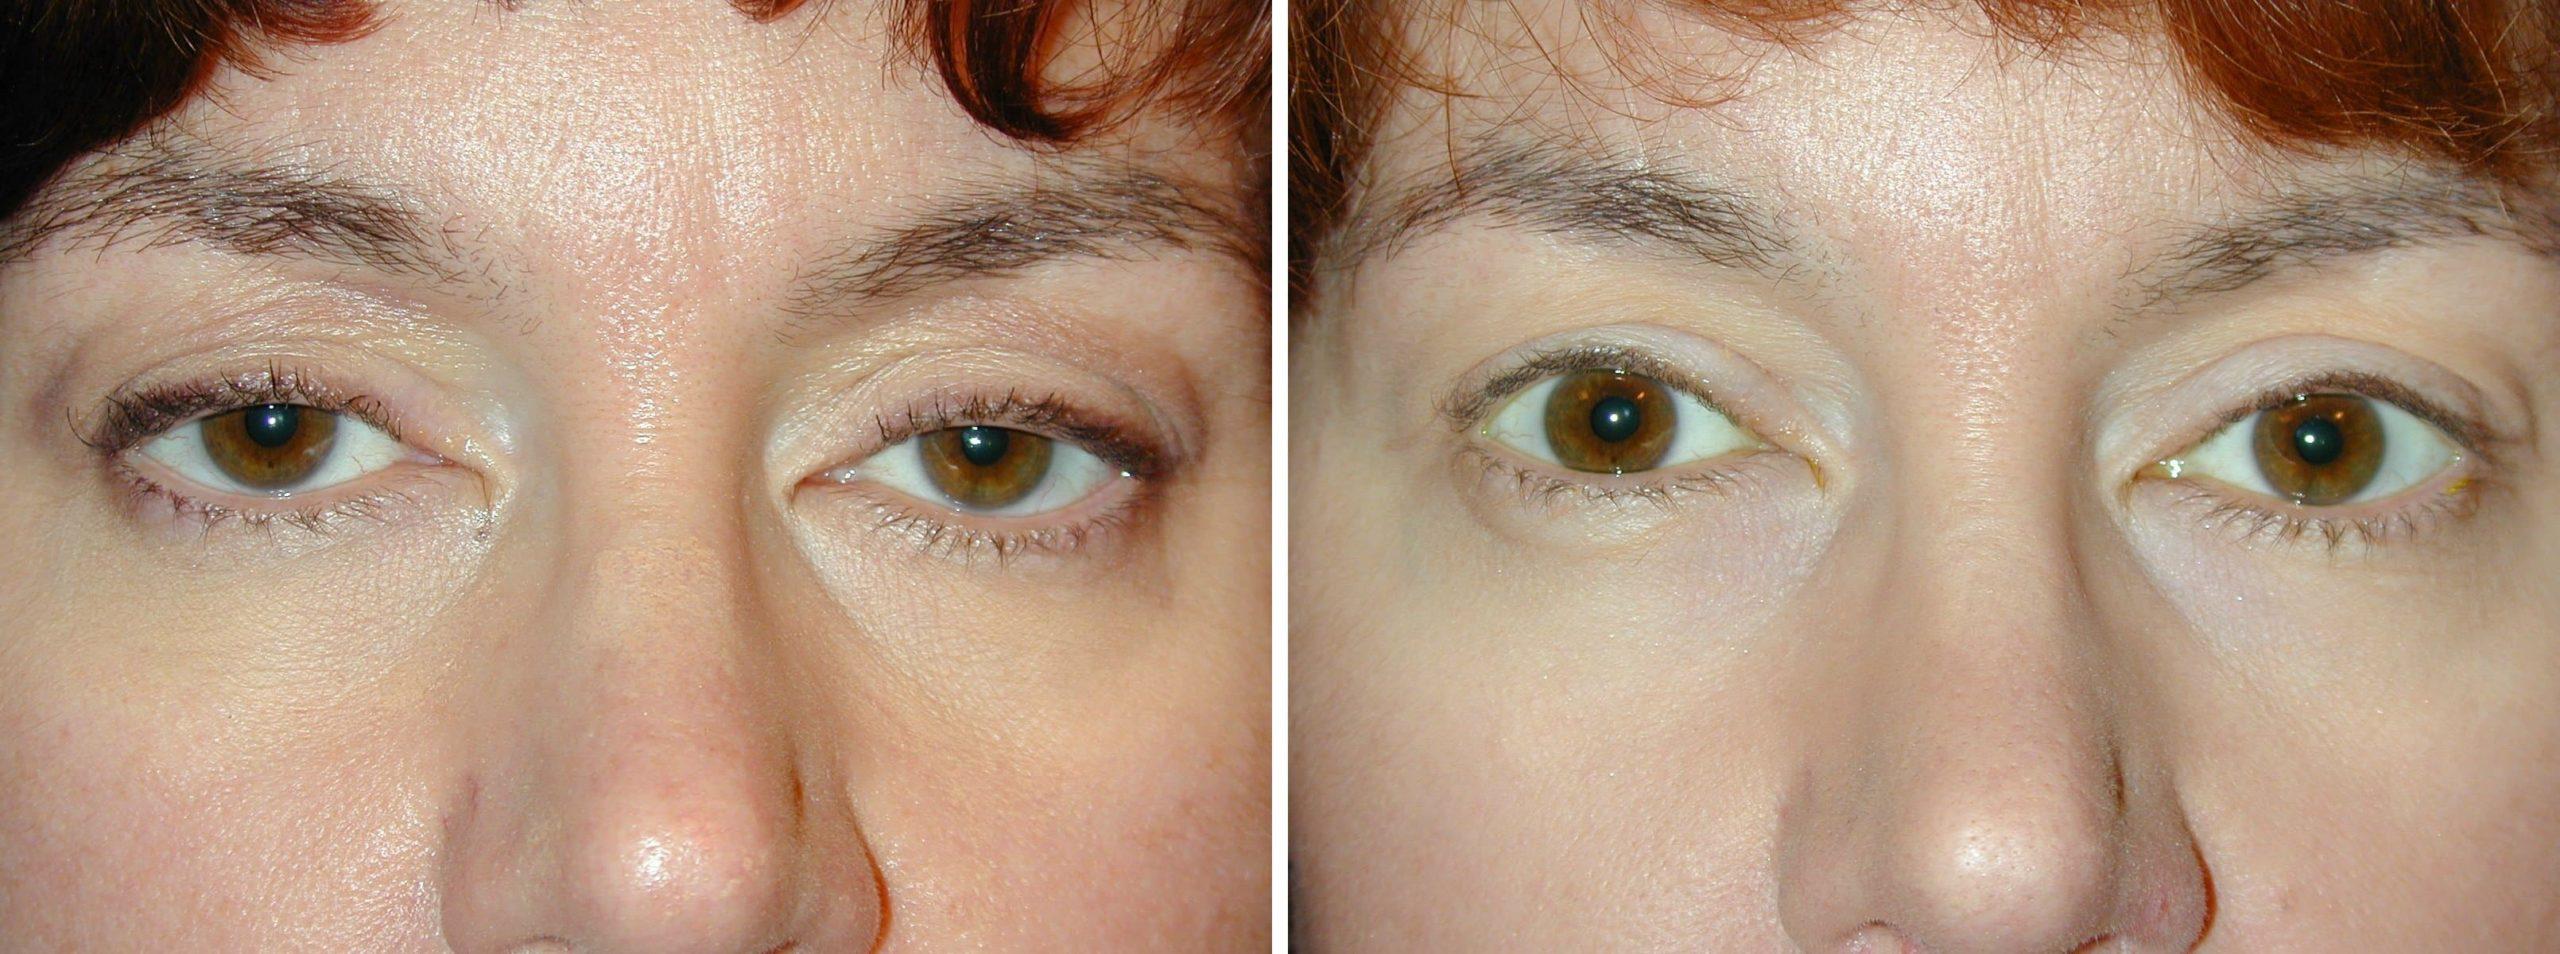 Botox Cause Droopy Eyelids